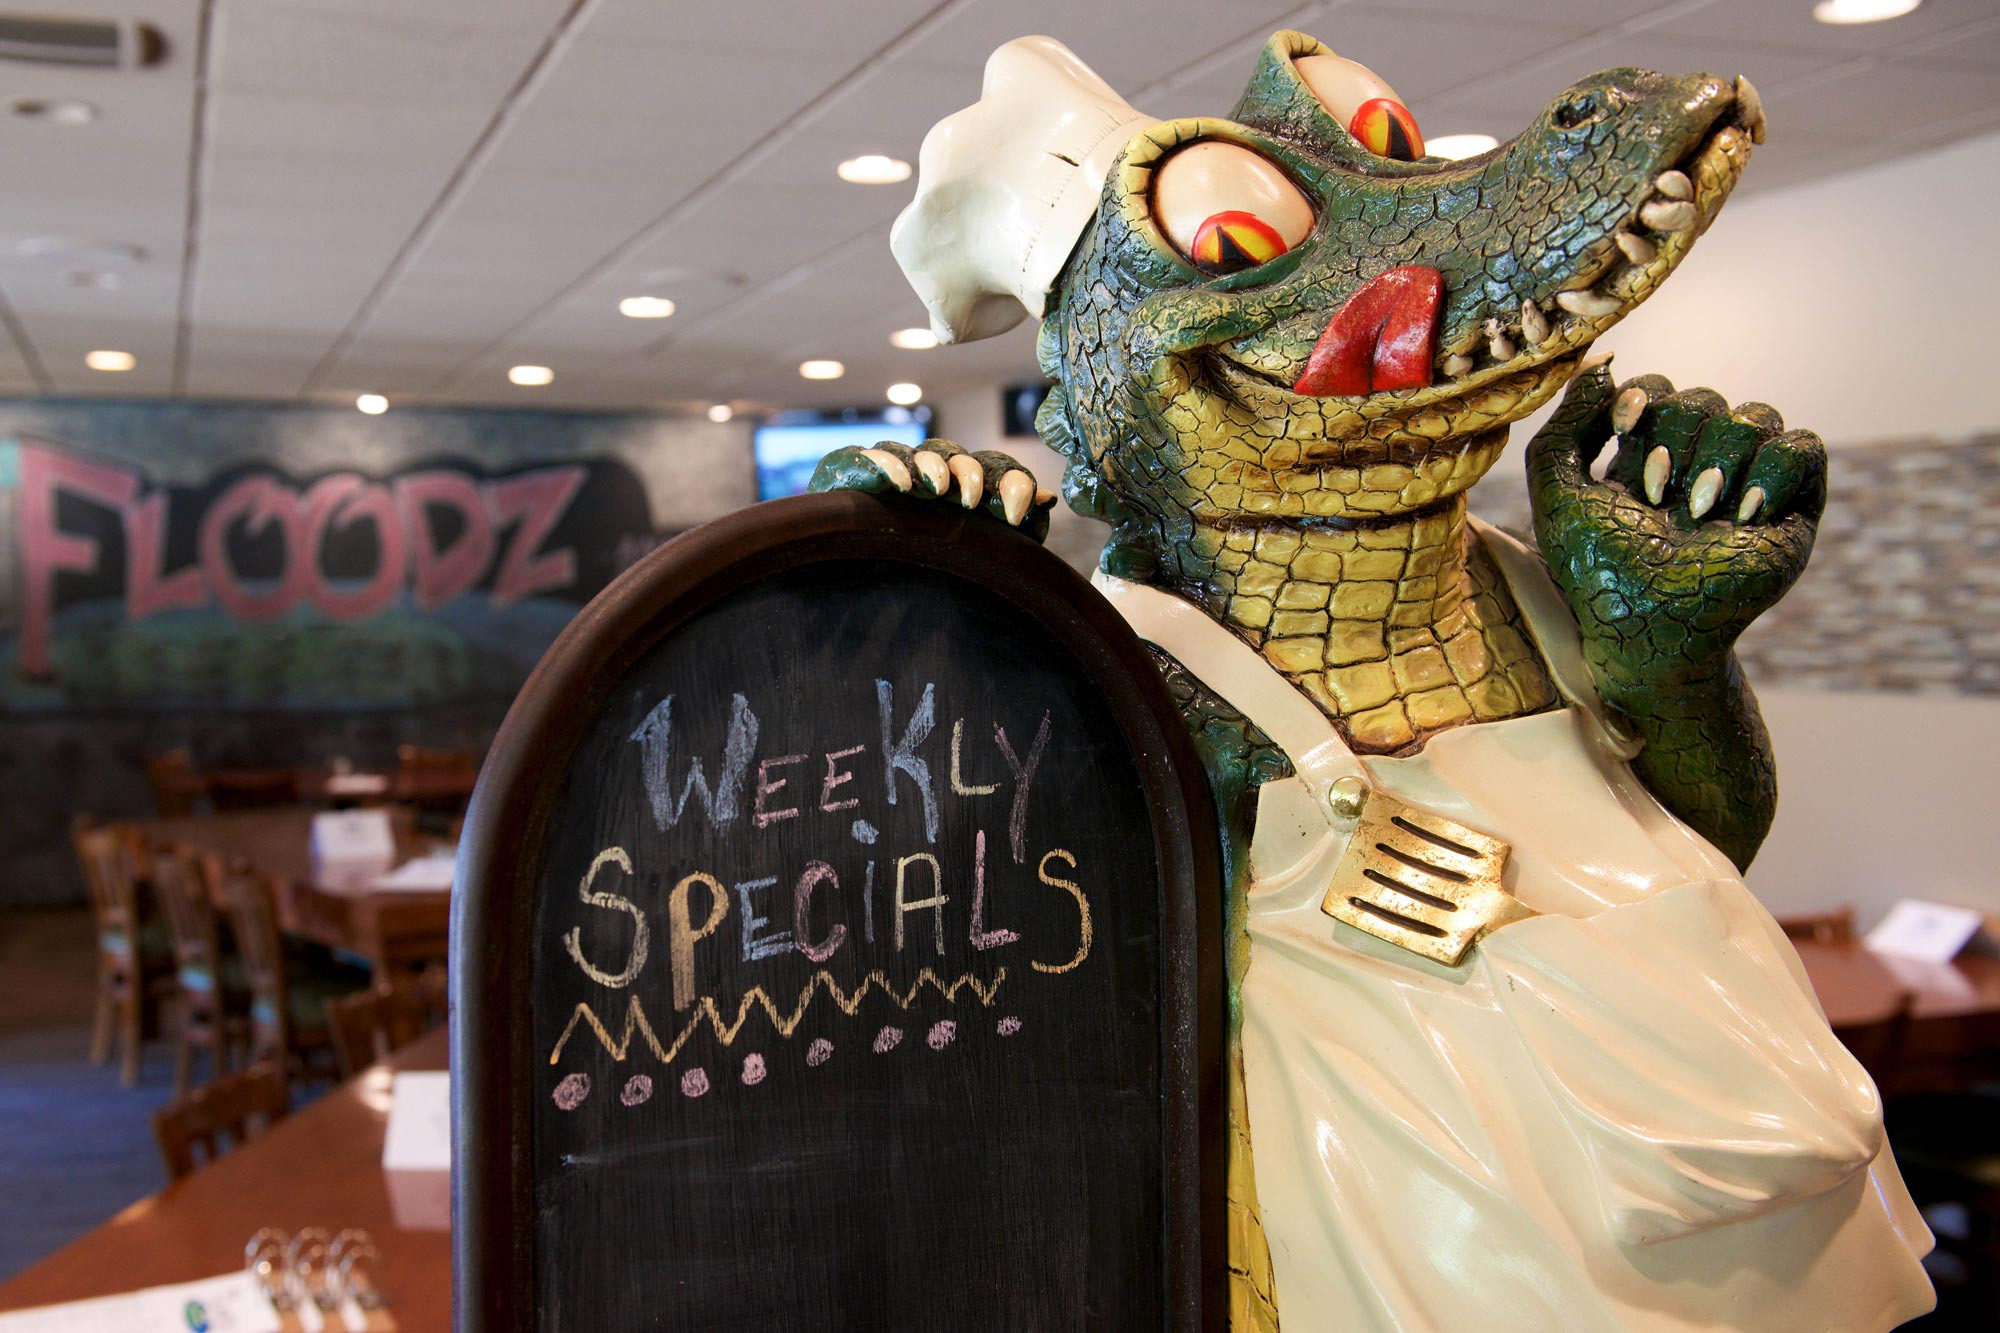 Floodz Bar and Grill Specials